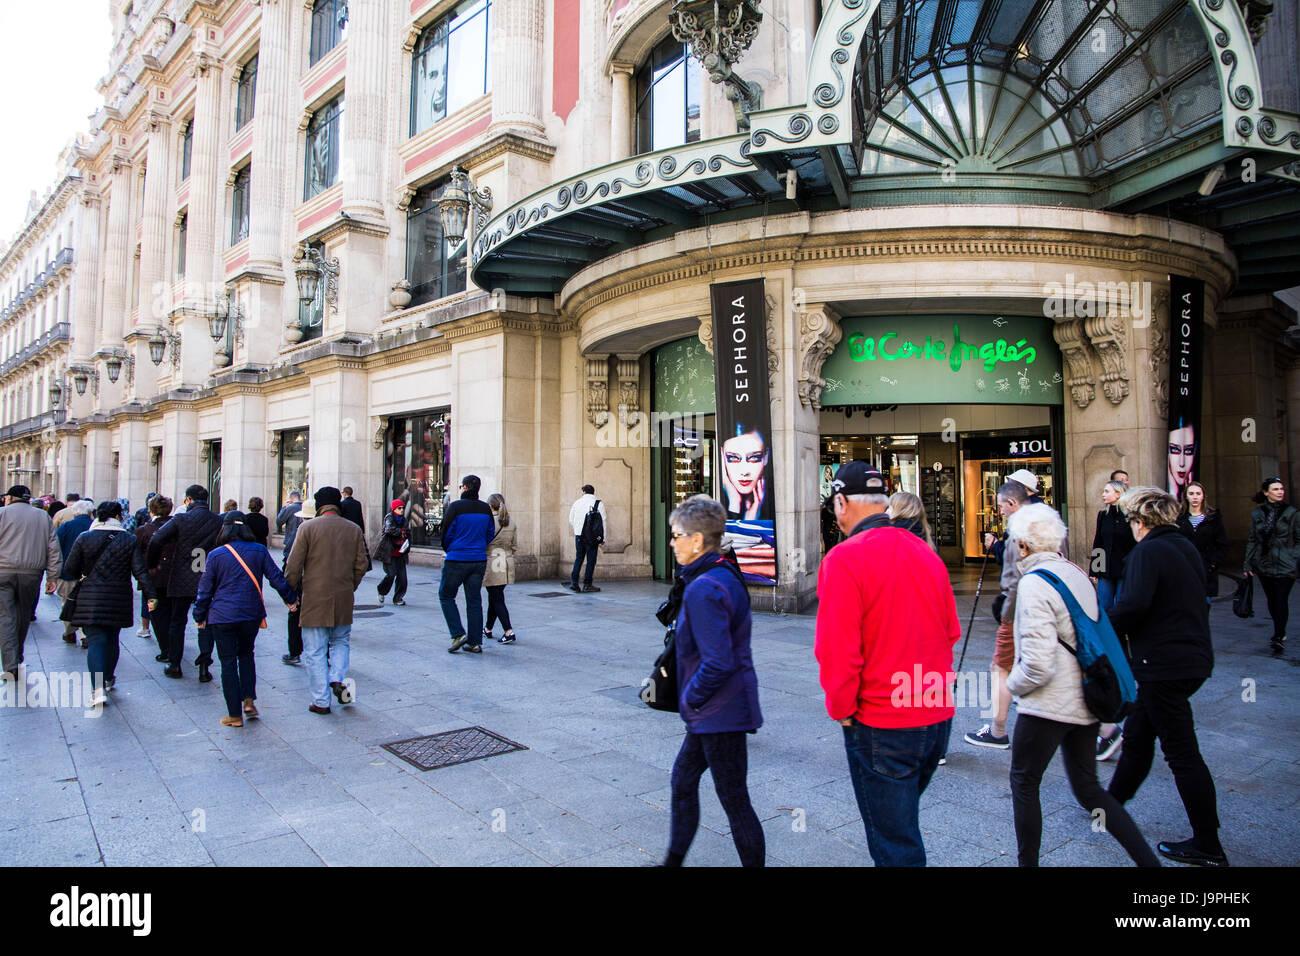 Portal de L'Angel is a popular pedestrian/shopping street in the Ciutat Vella district of Barcelona. Spain. - Stock Image